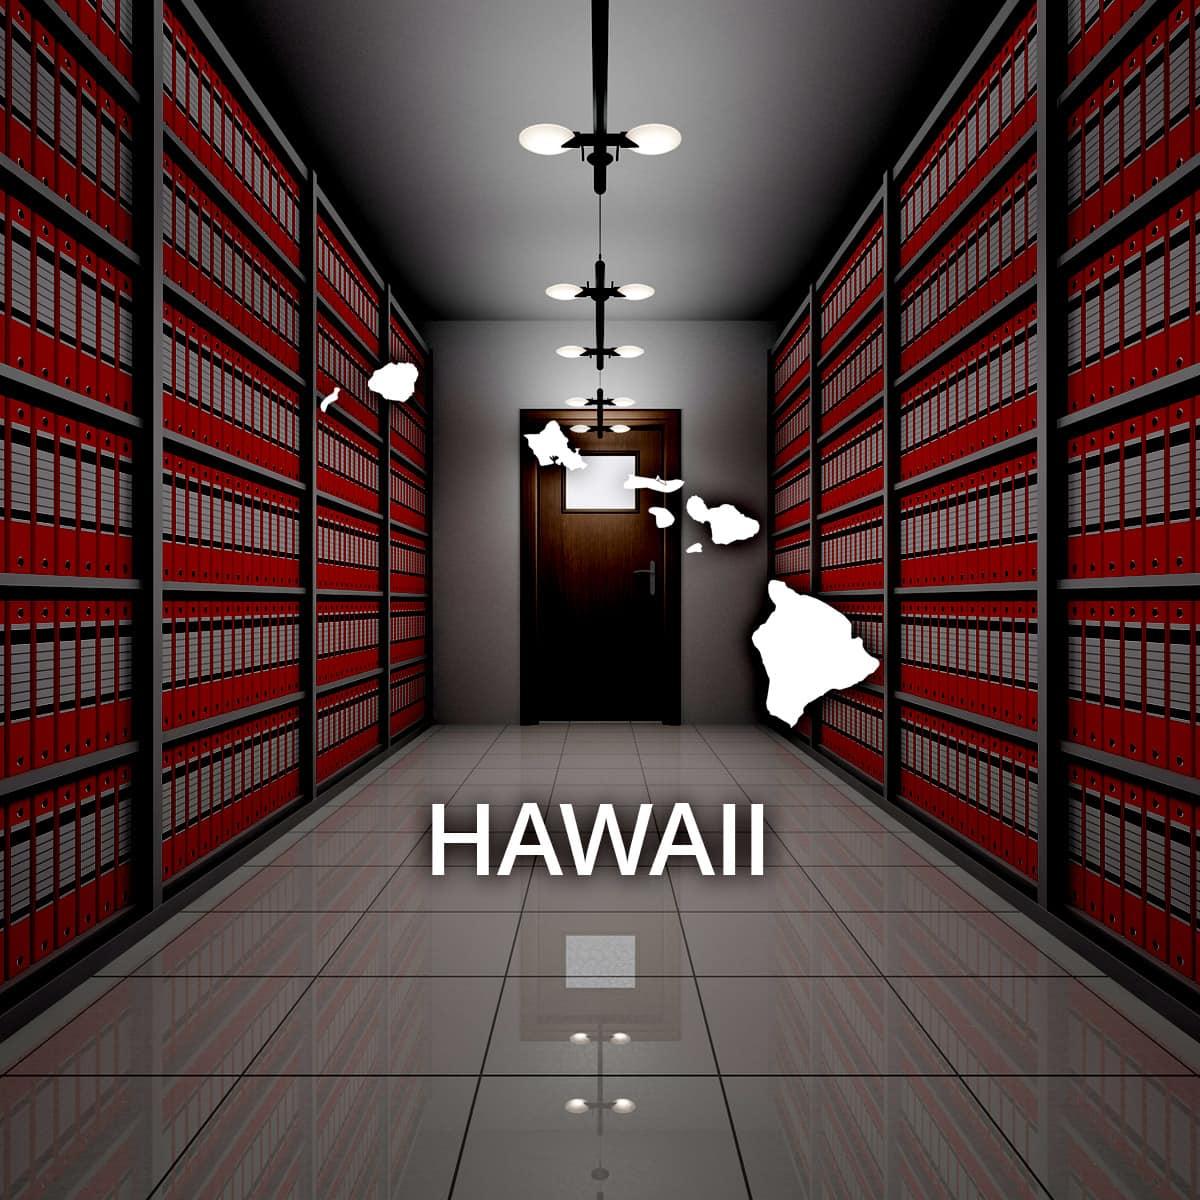 Hawaii Public Records